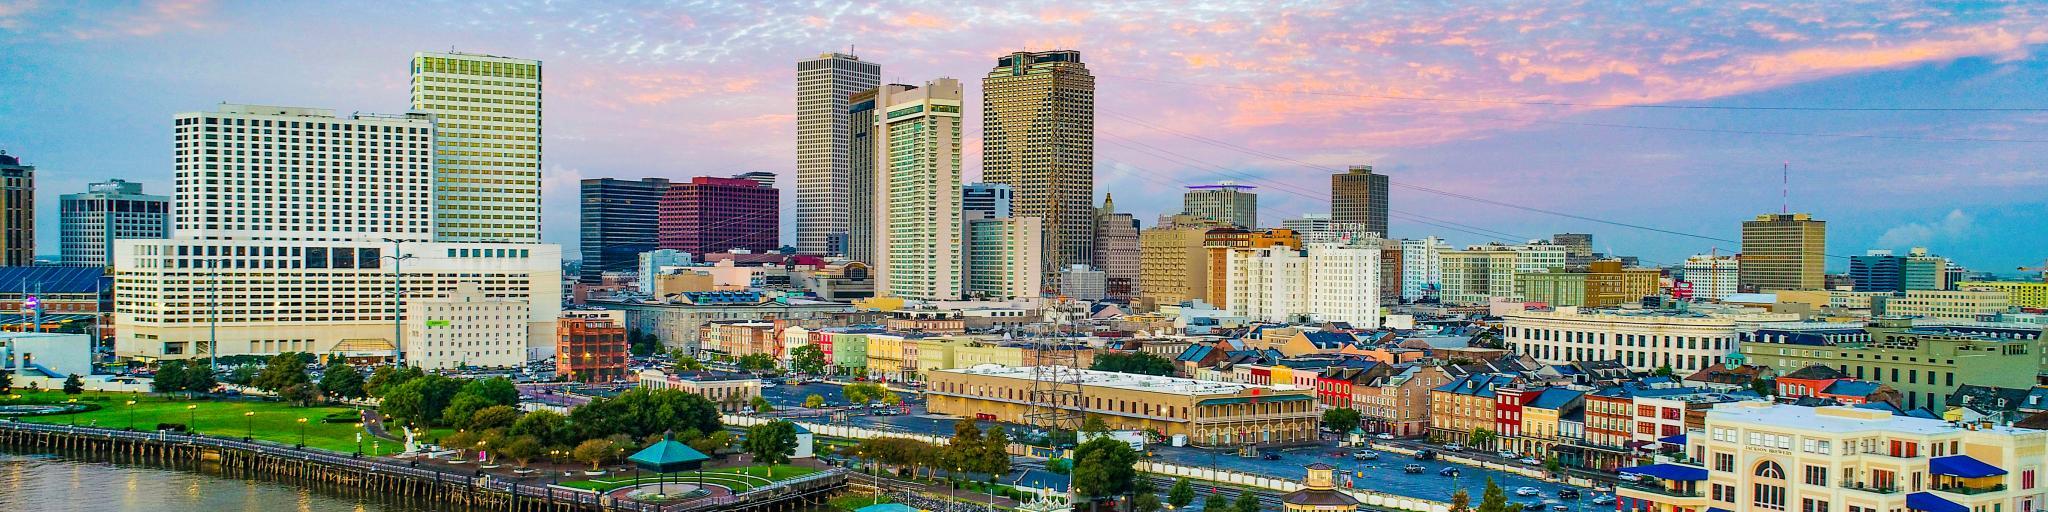 Skyline of New Orleans. Louisiana